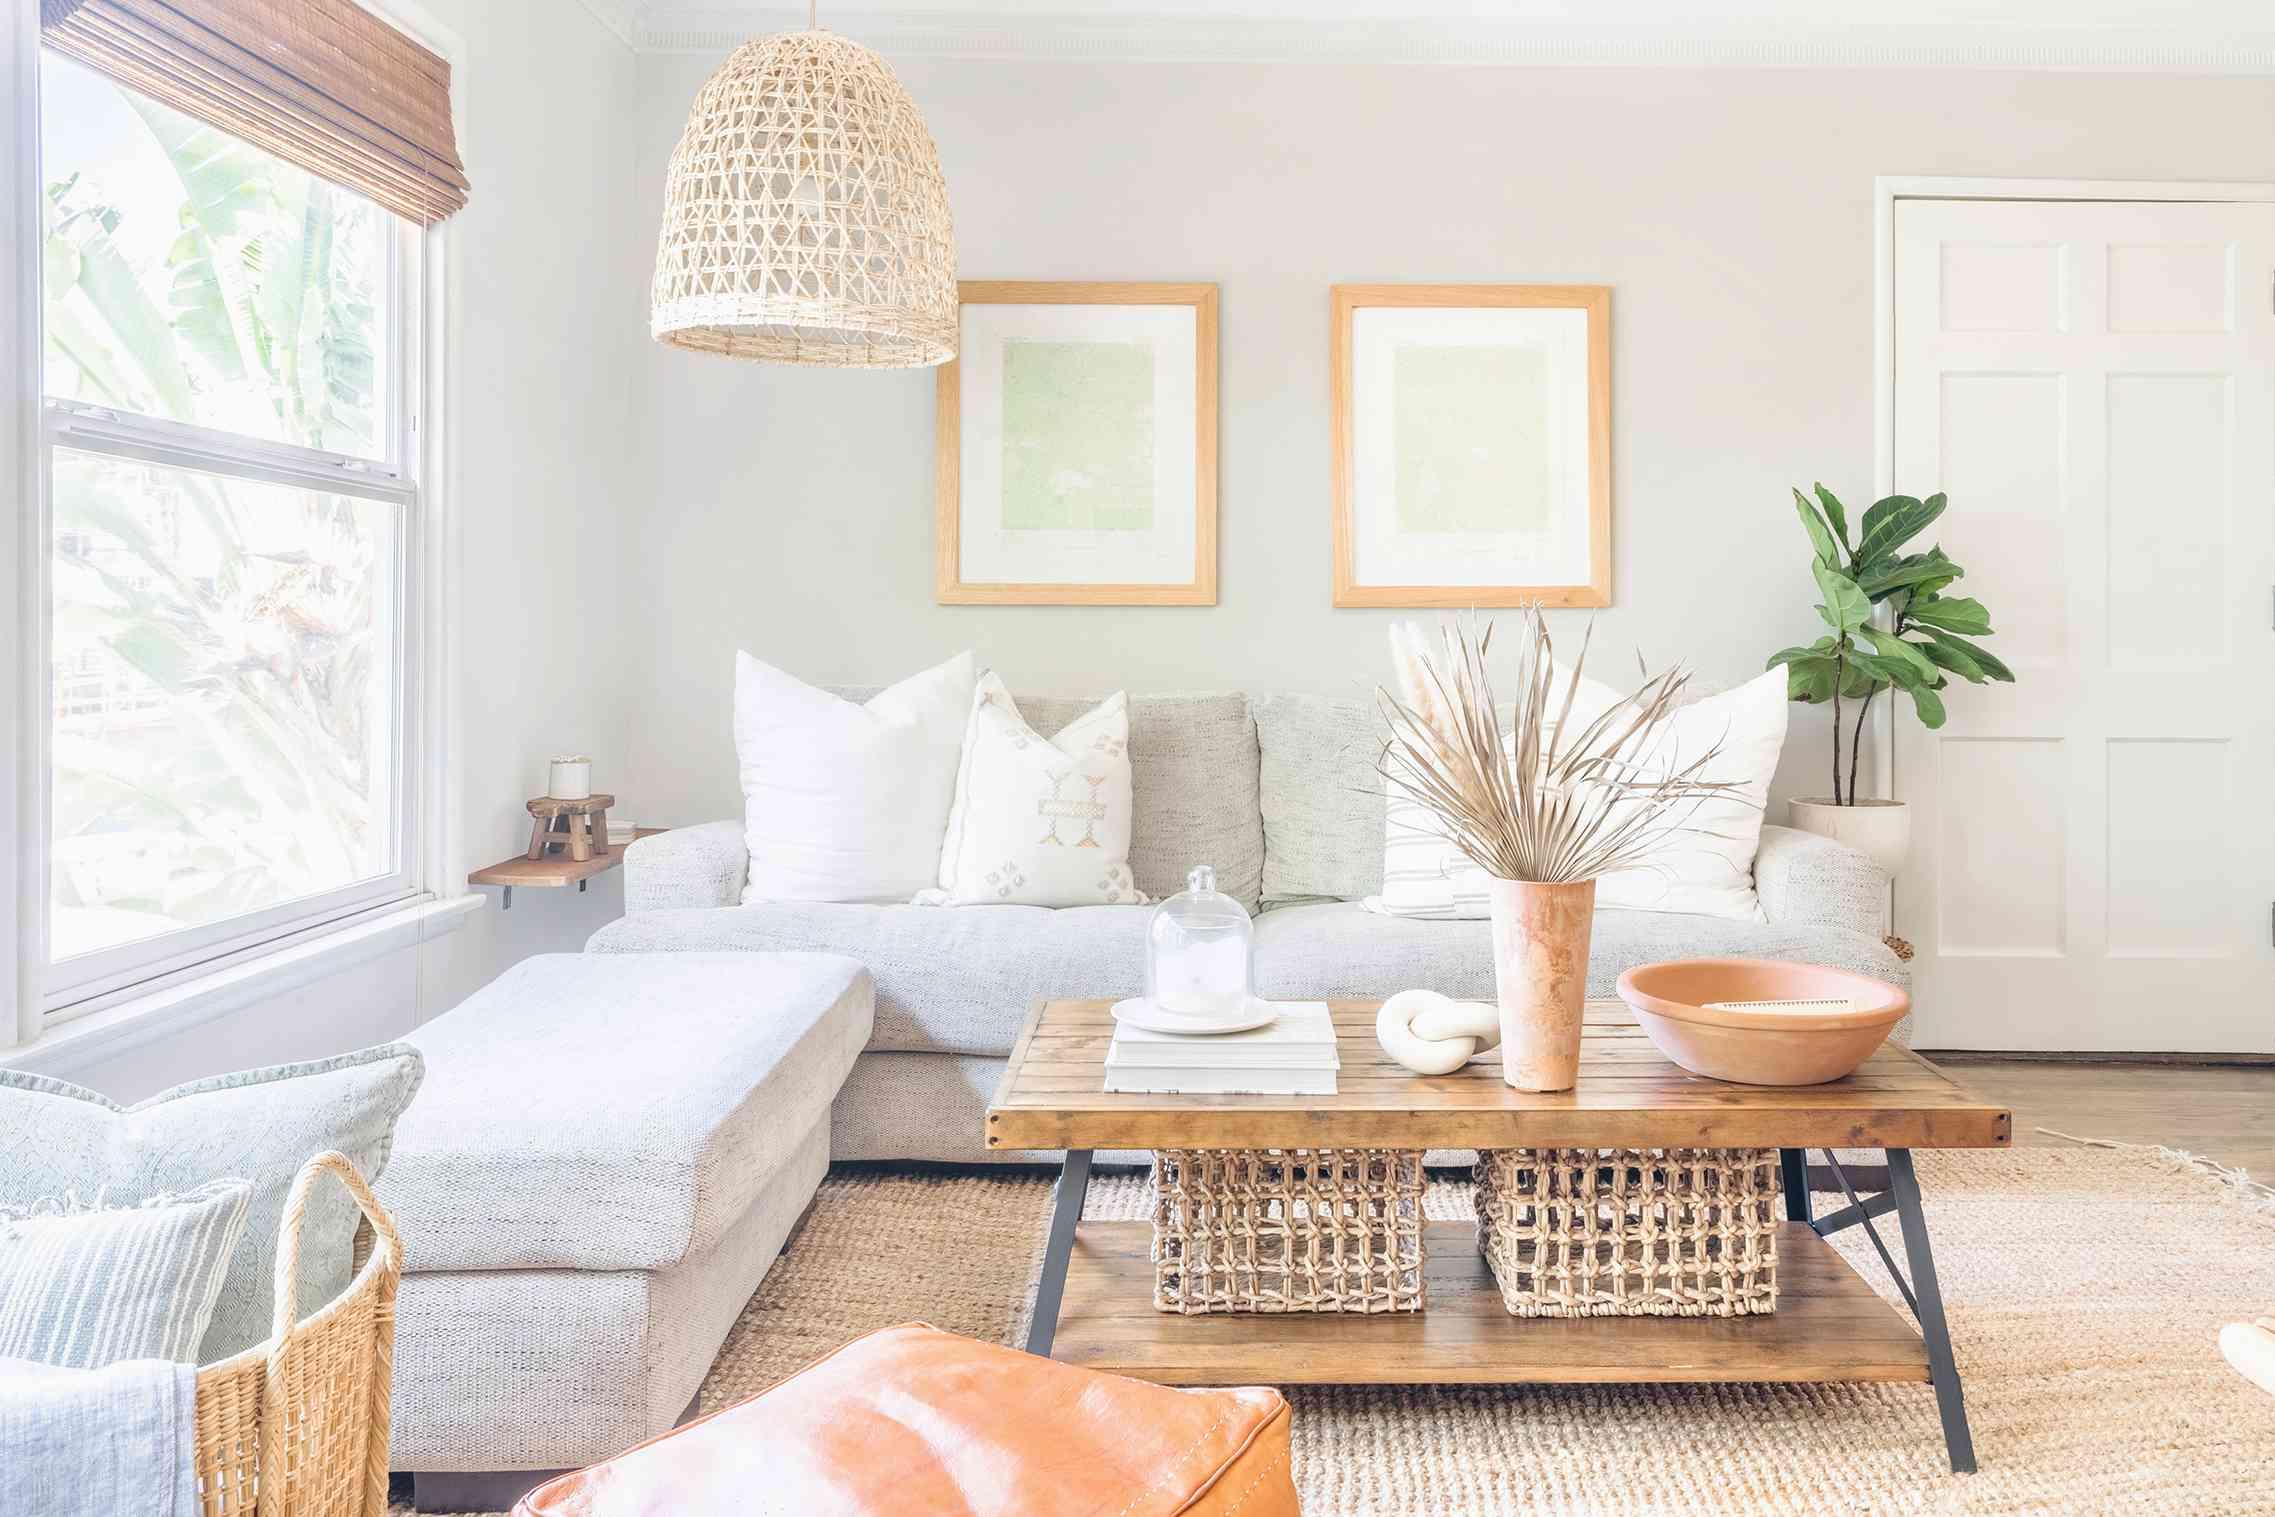 alisha agrellas home tour - sala de estar con relajantes tonos tierra